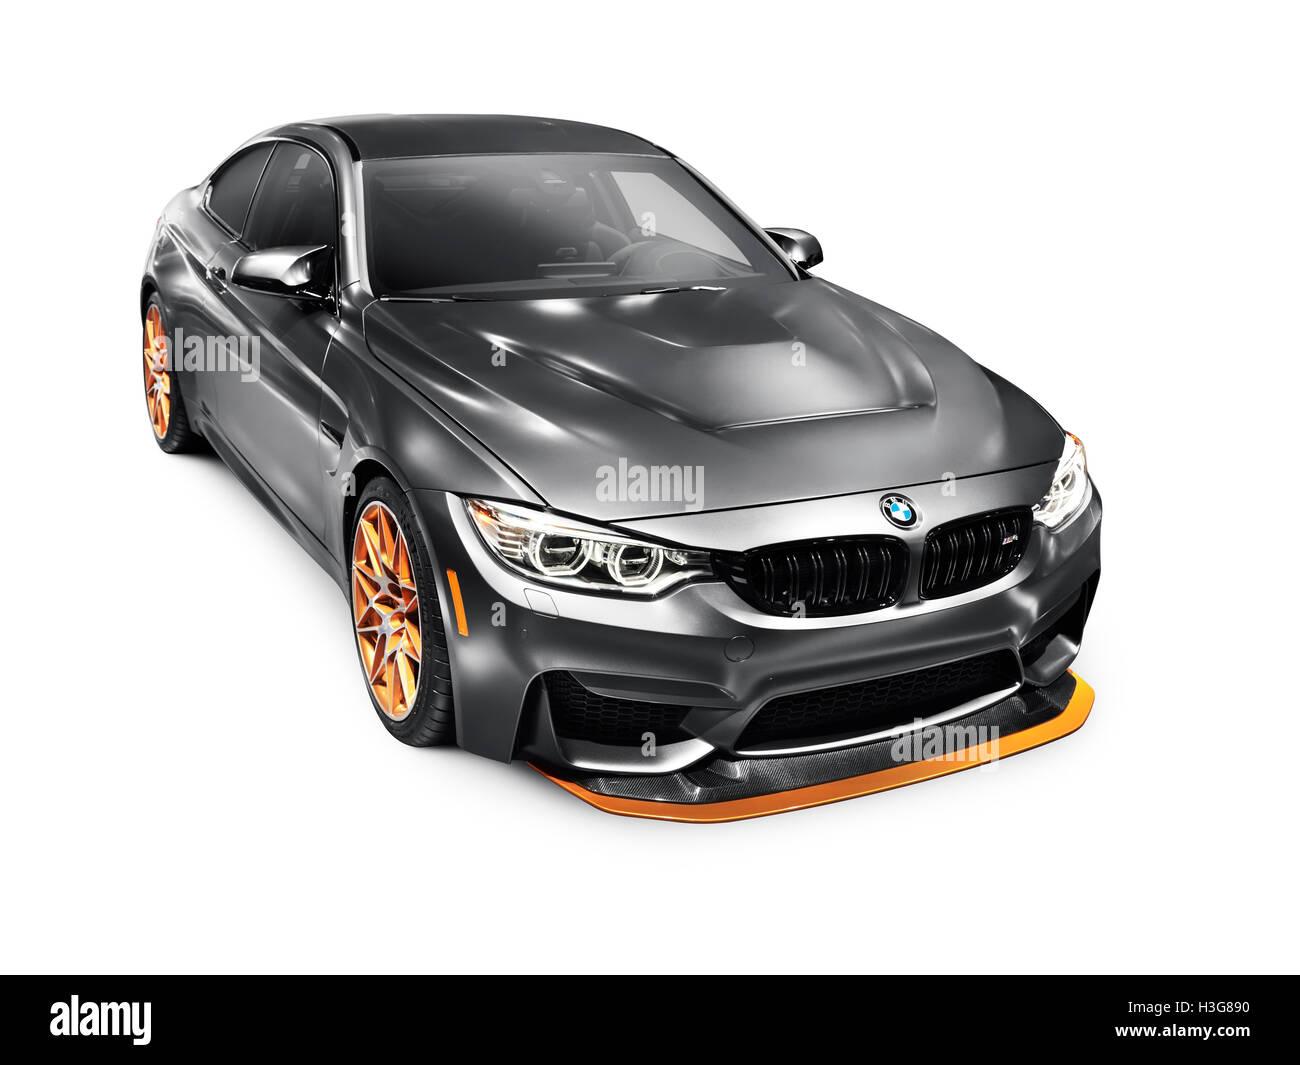 High Performance Cars Stock Photos Amp High Performance Cars